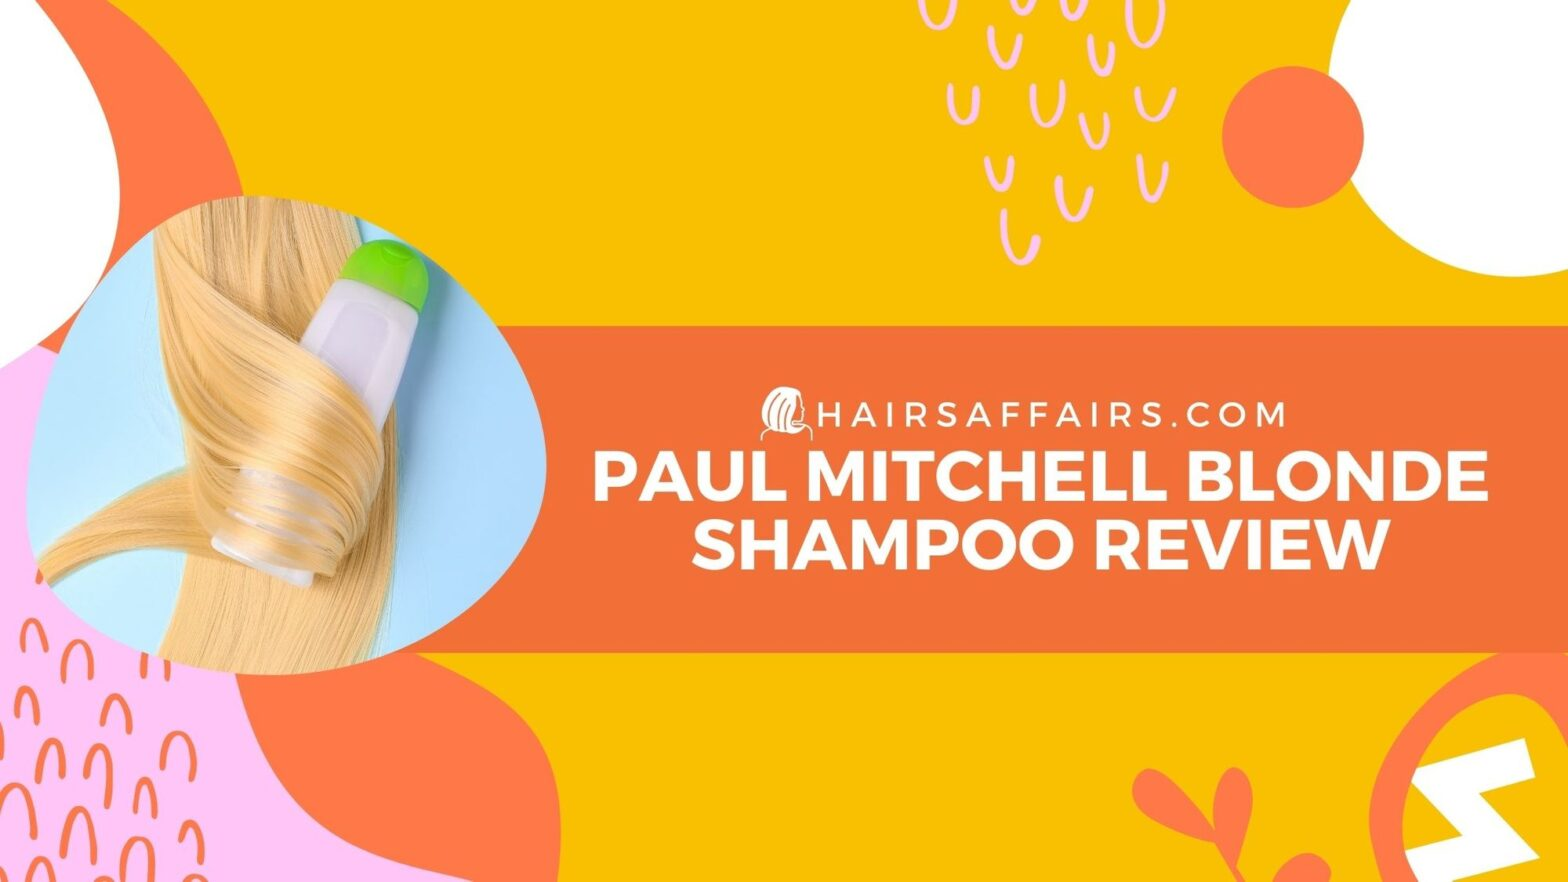 HA-Paul-mitchell-blonde-shampoo-review